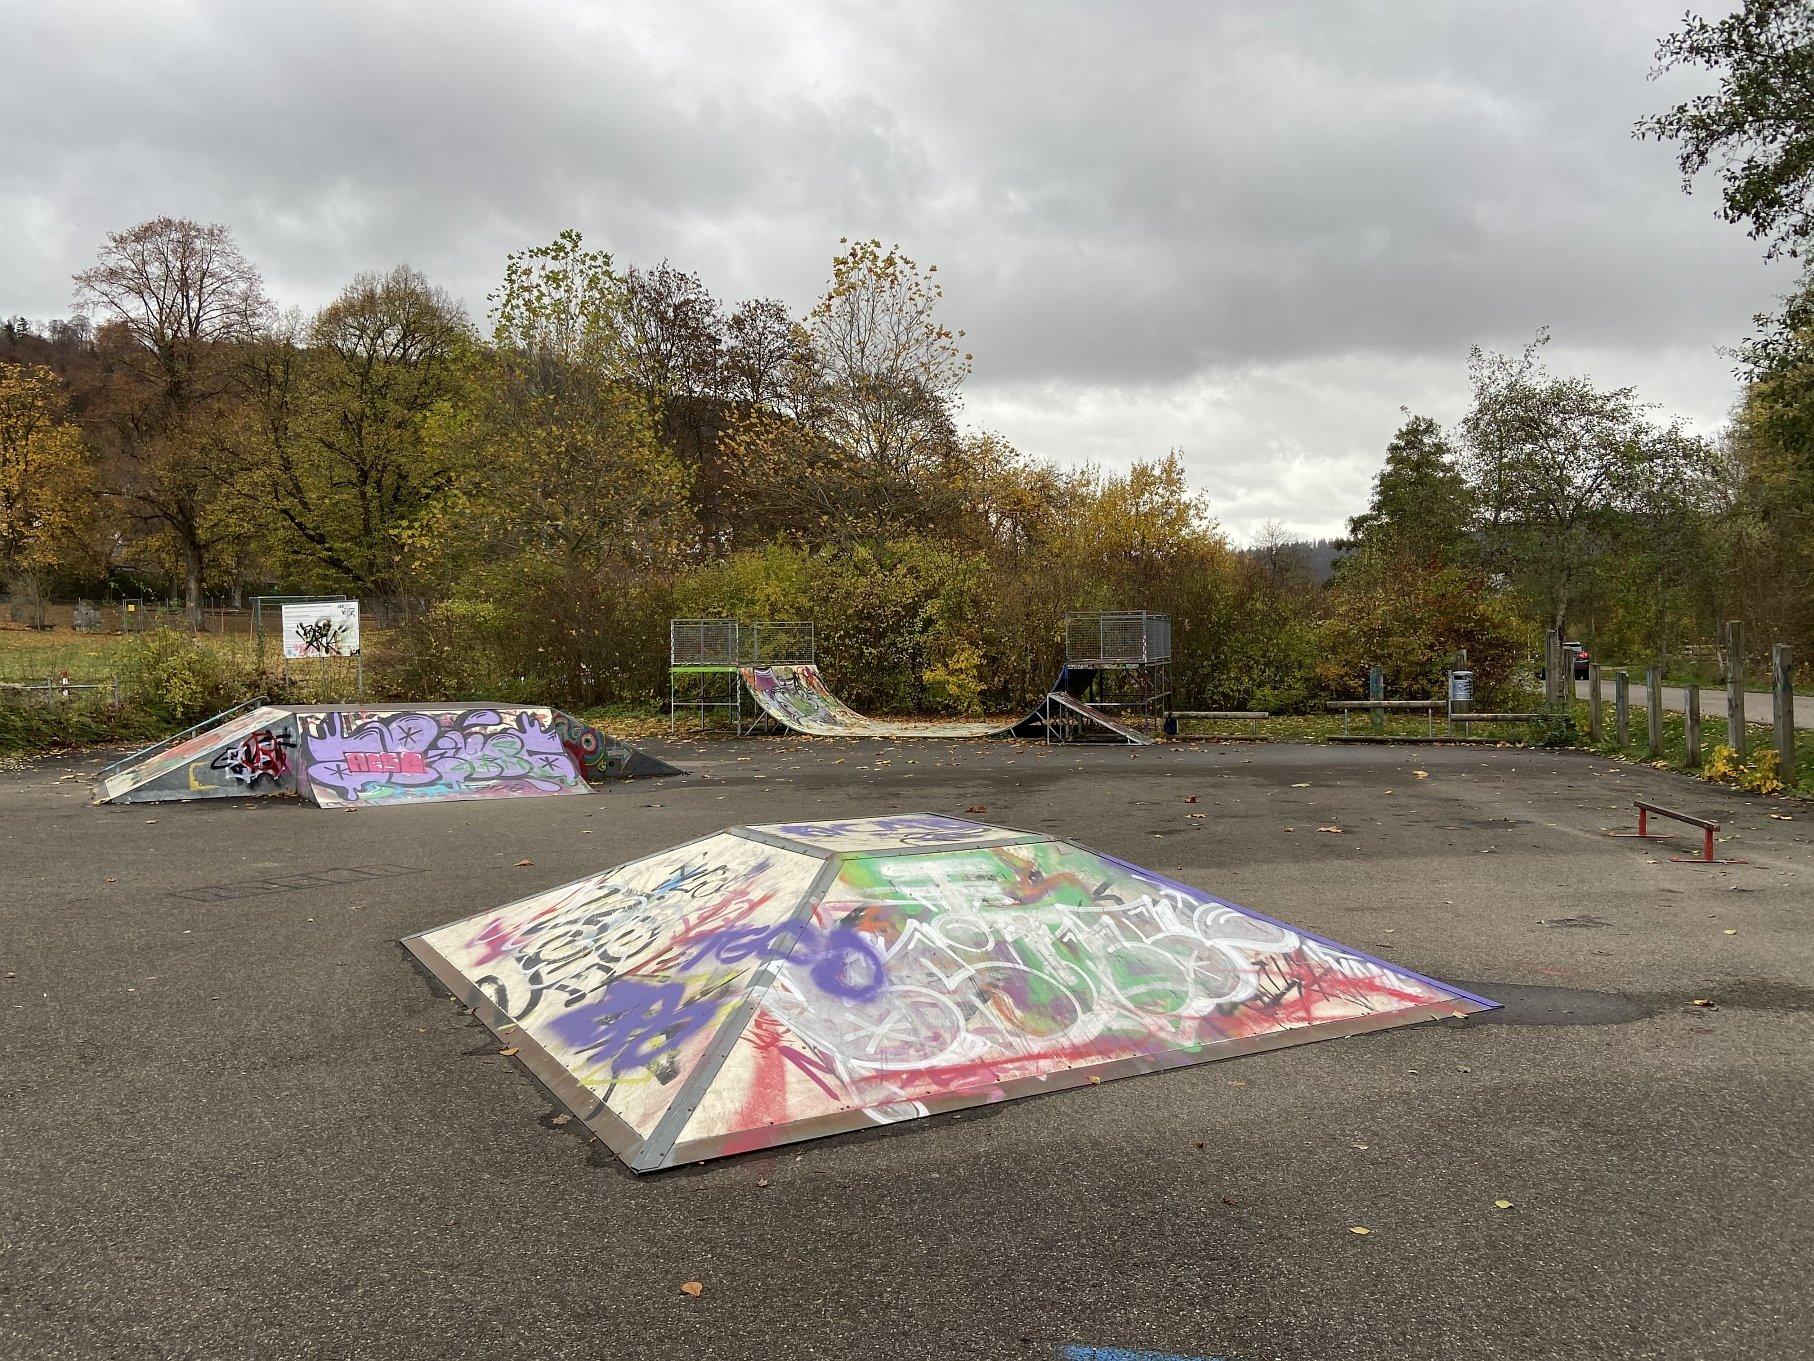 Skateplatz Mazmann in Albstadt-Ebingen